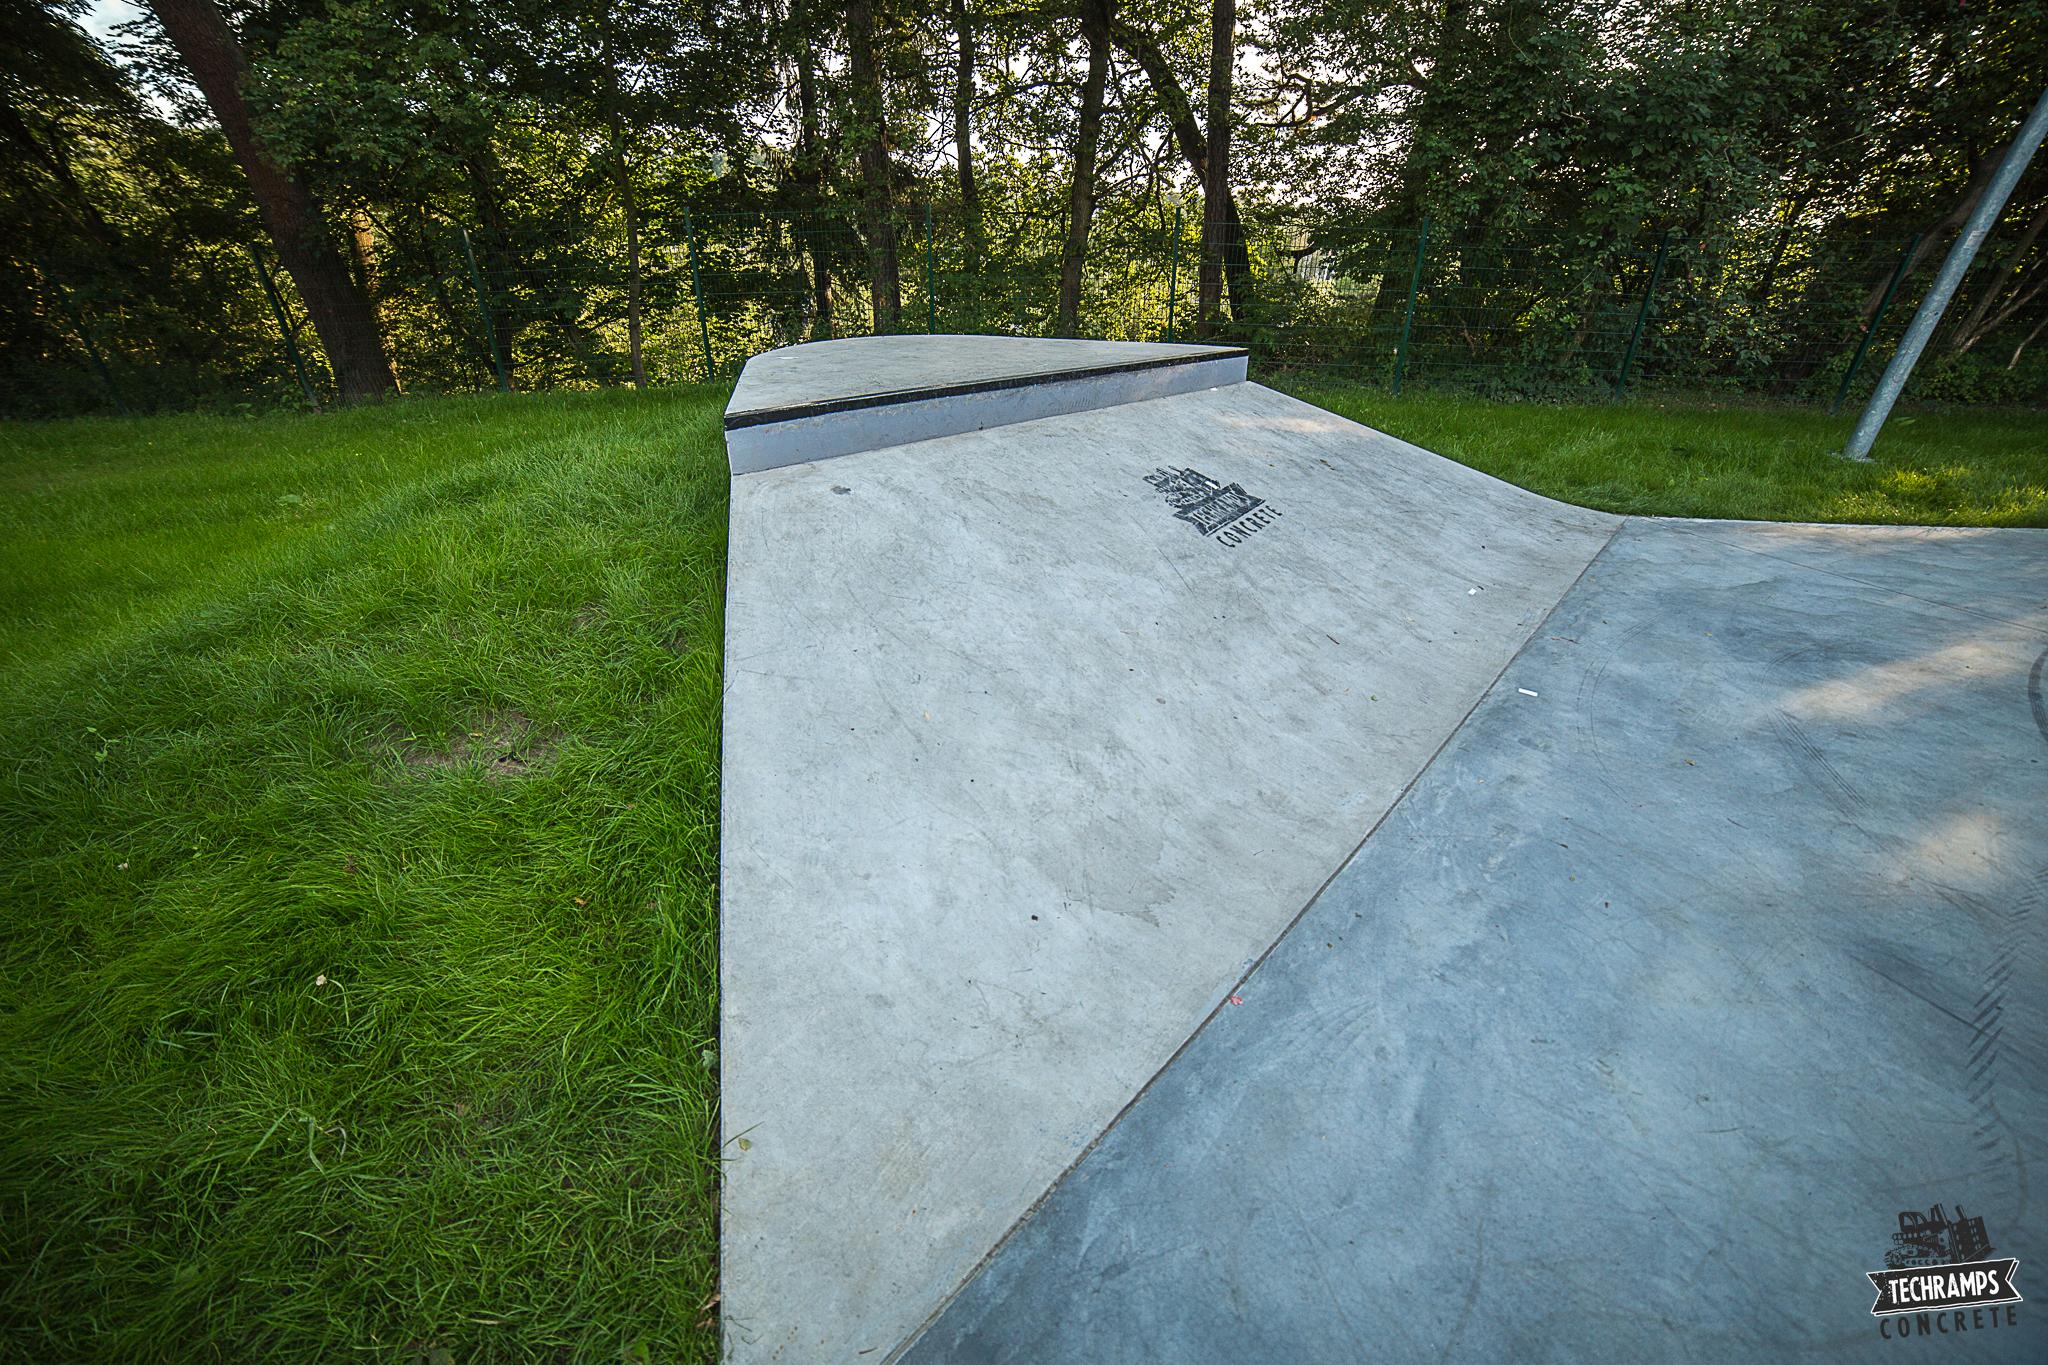 Skatepark betonowy Techramps - Rabka Zdrój